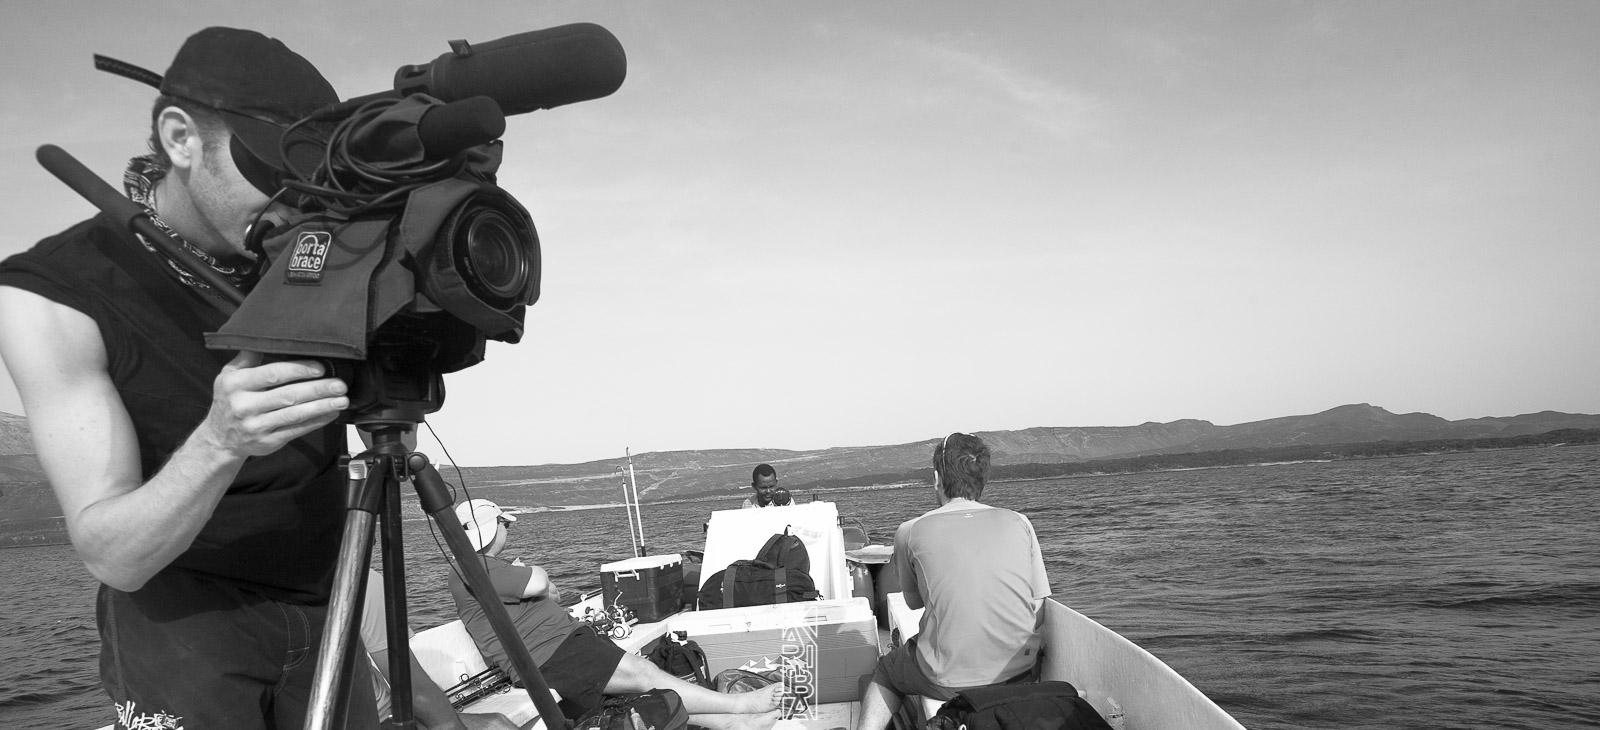 076-Djibouti-042009-Obock.jpg